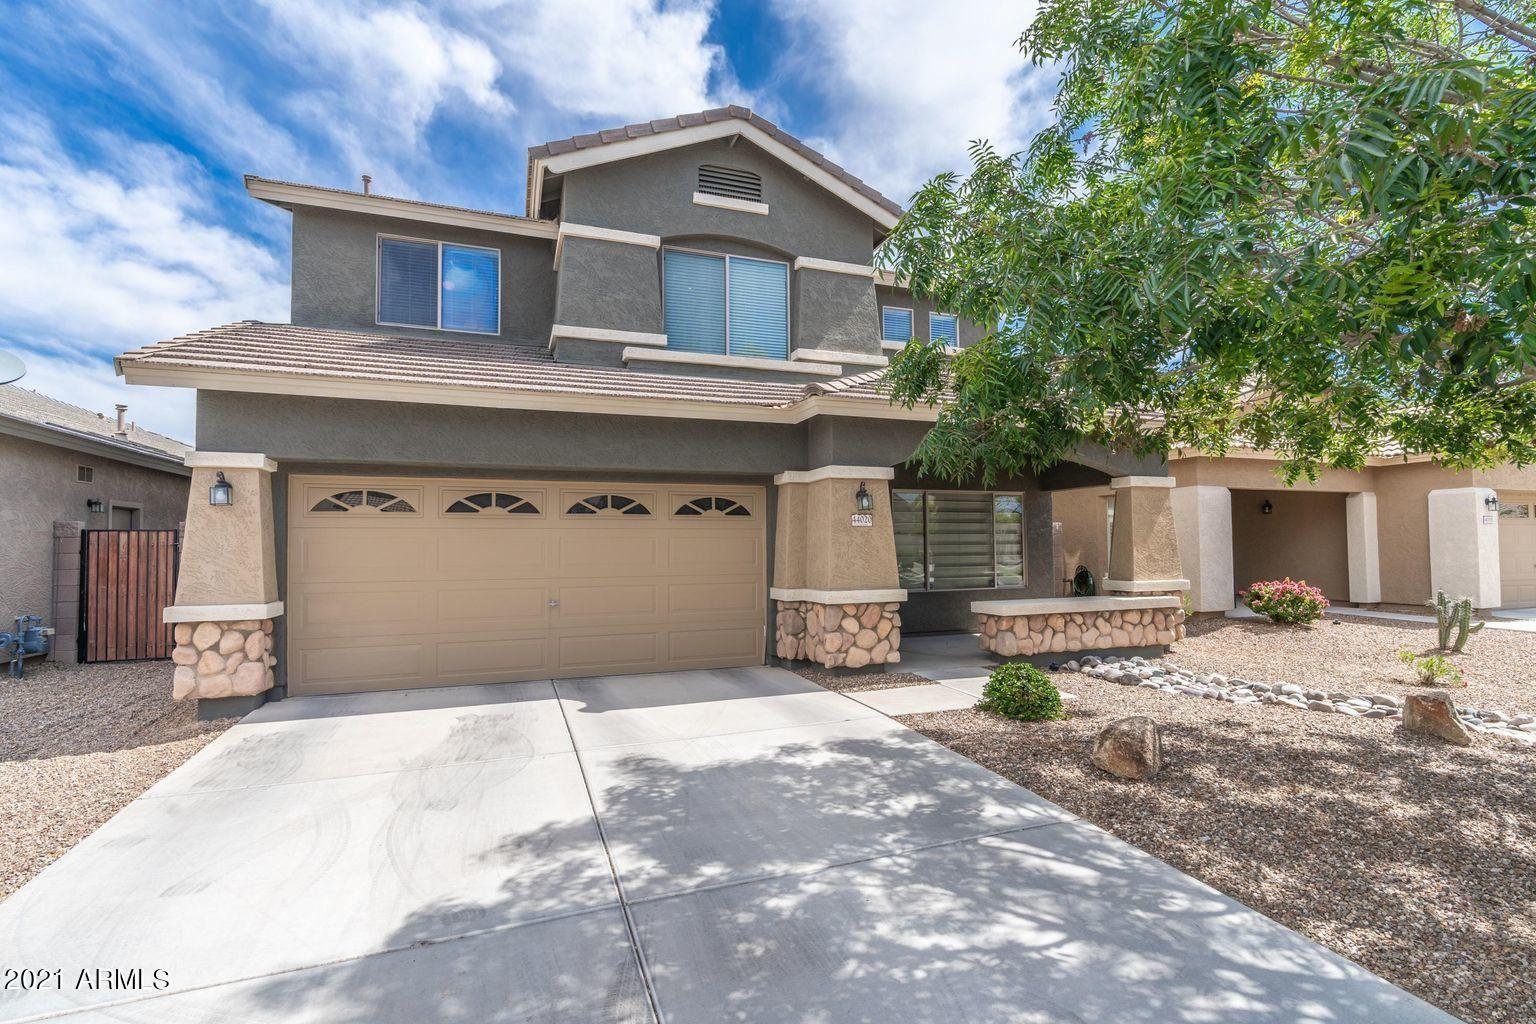 Photo for 44020 W GARDEN Lane, Maricopa, AZ 85139 (MLS # 6247302)